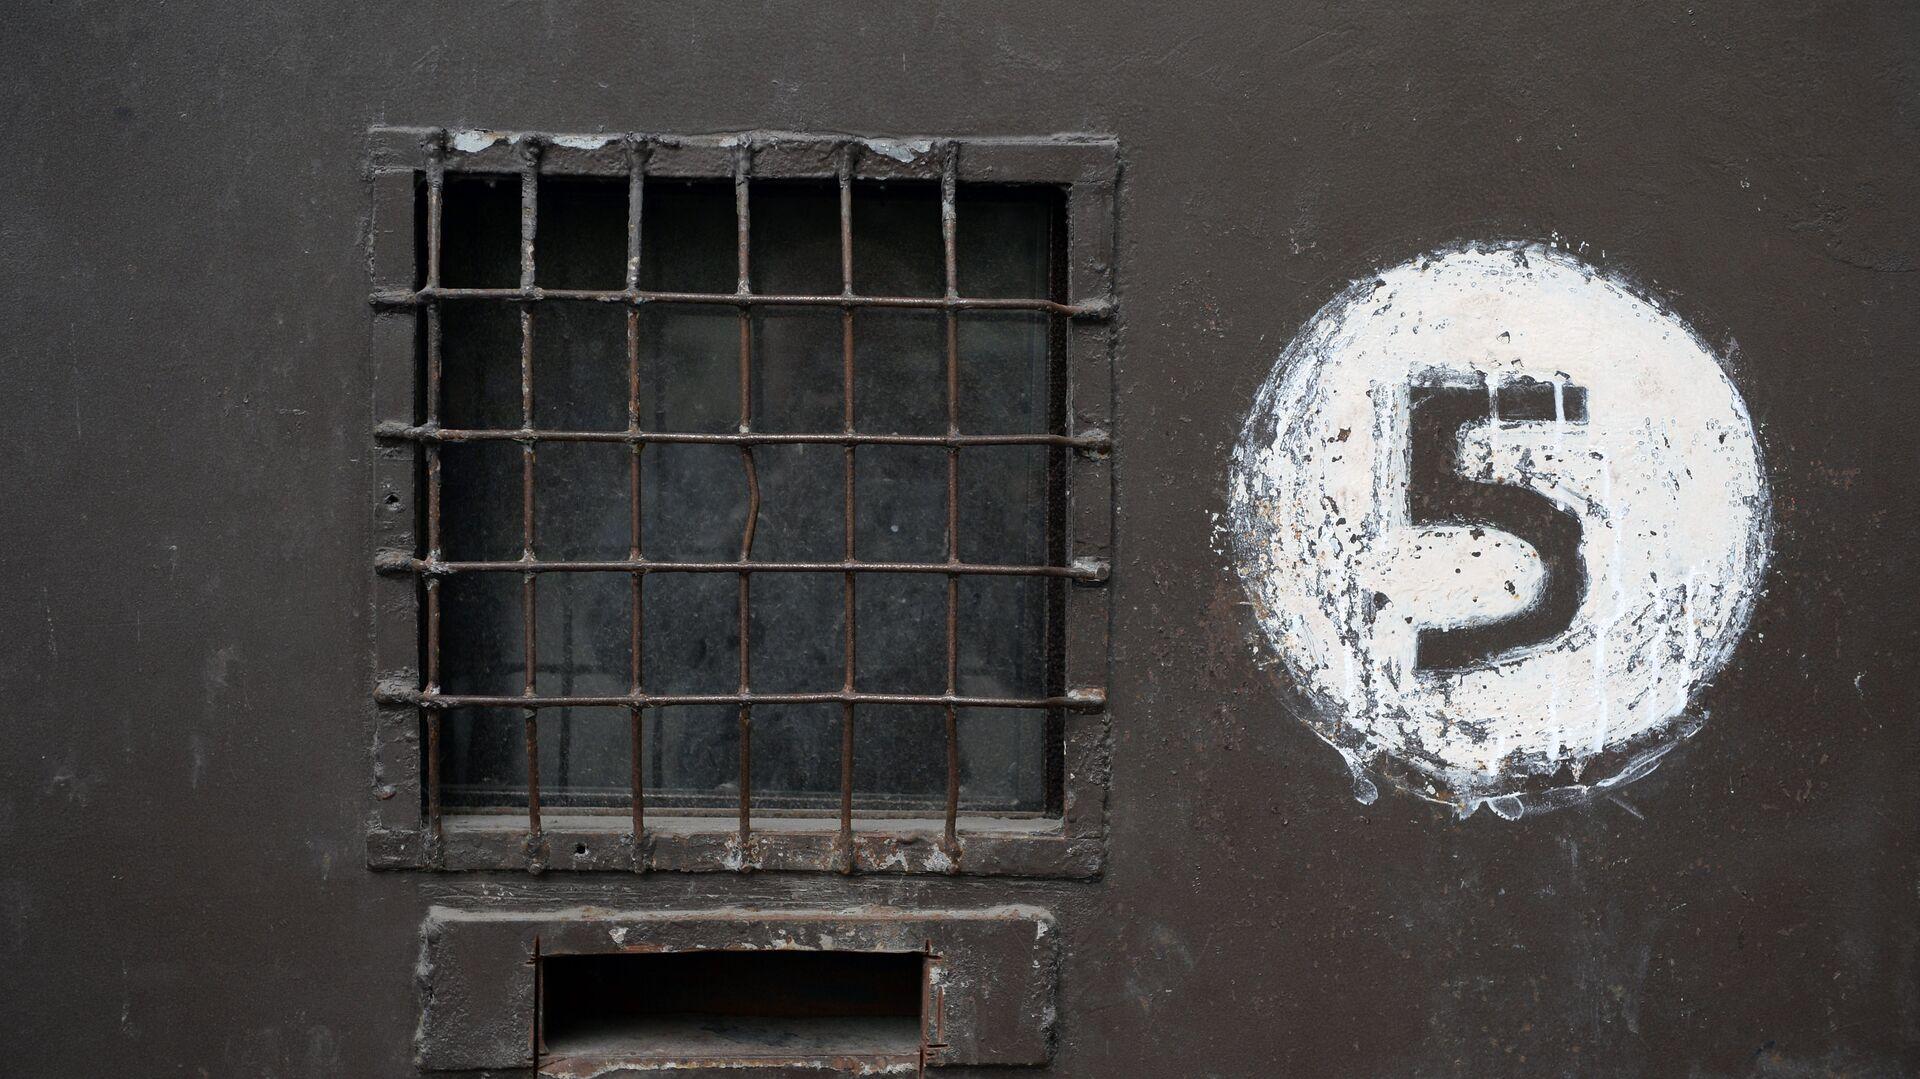 Las rejas de la cárcel (imagen referencial) - Sputnik Mundo, 1920, 29.09.2021